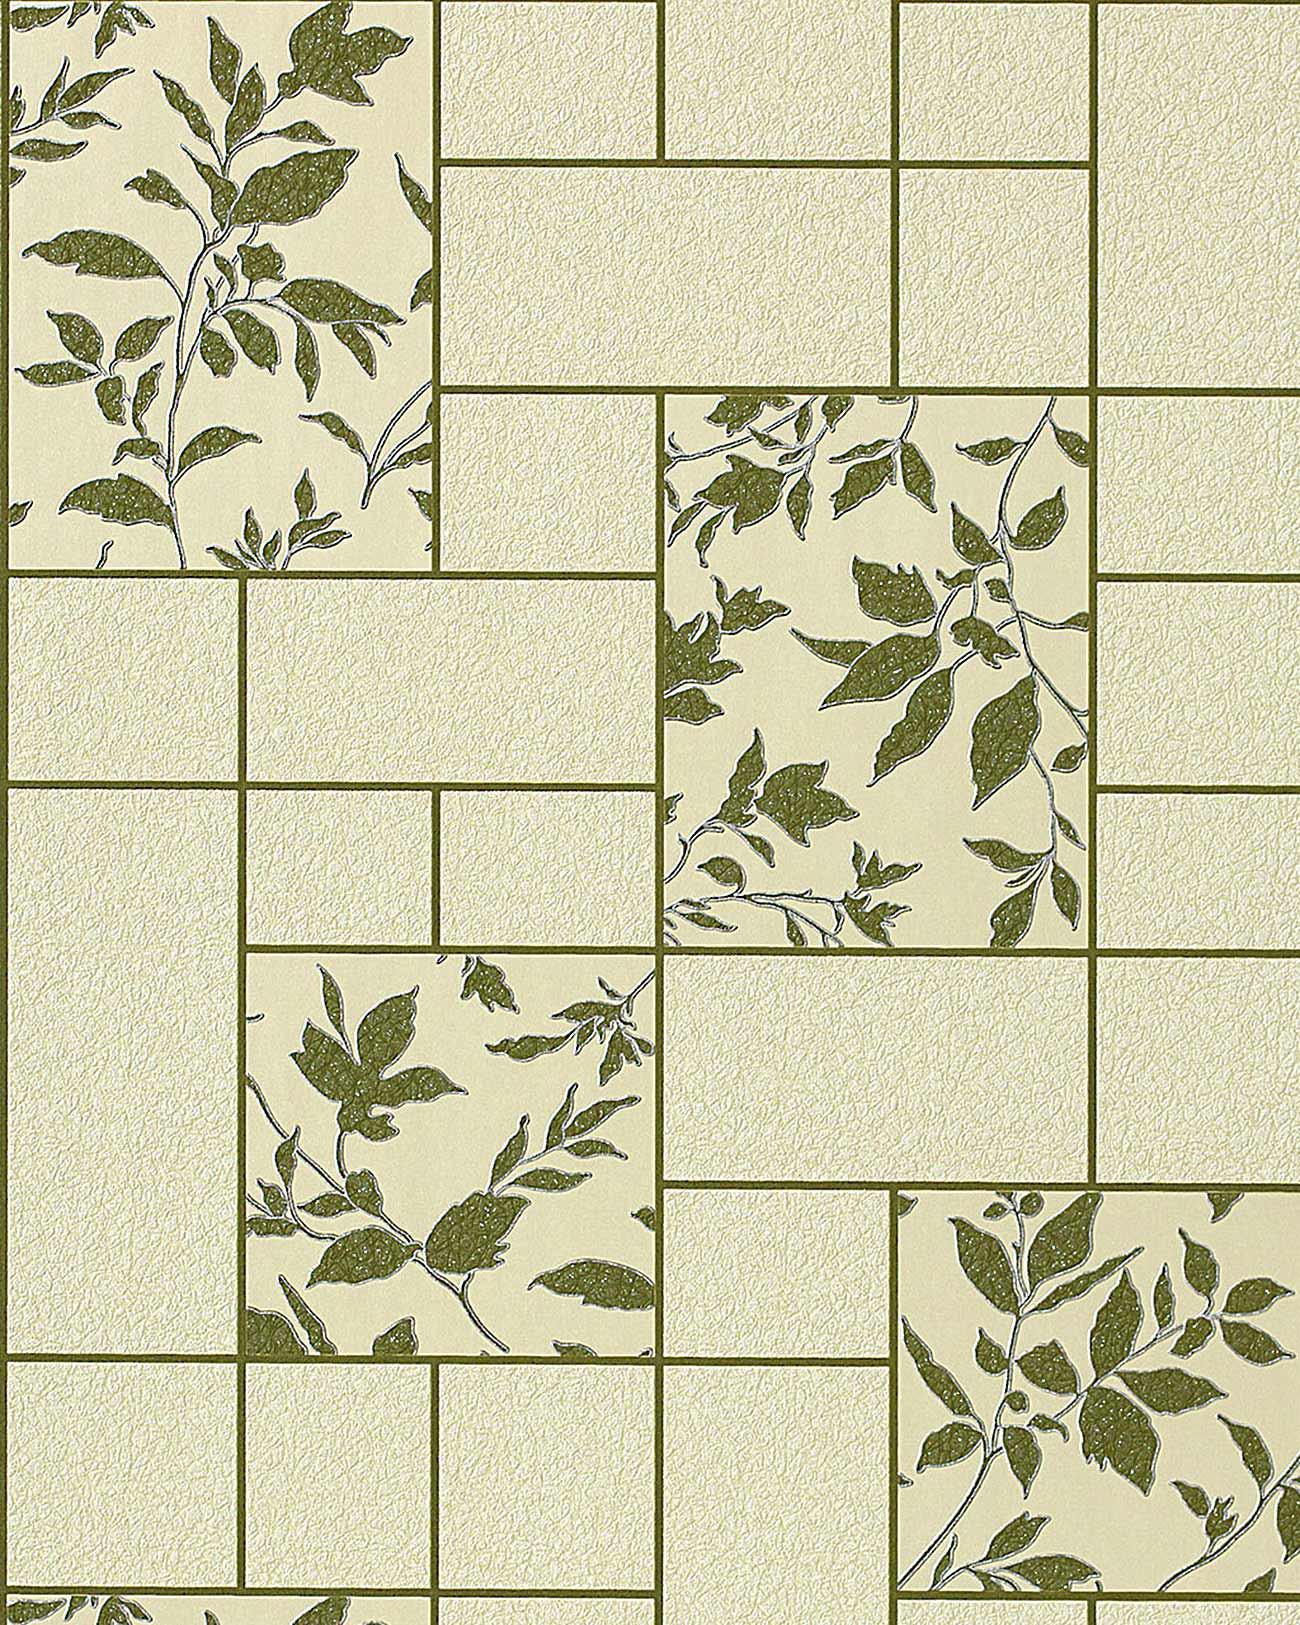 k chen tapete badezimmer tapete edem 146 25 fliesen kacheln optik florales muster beige gr n